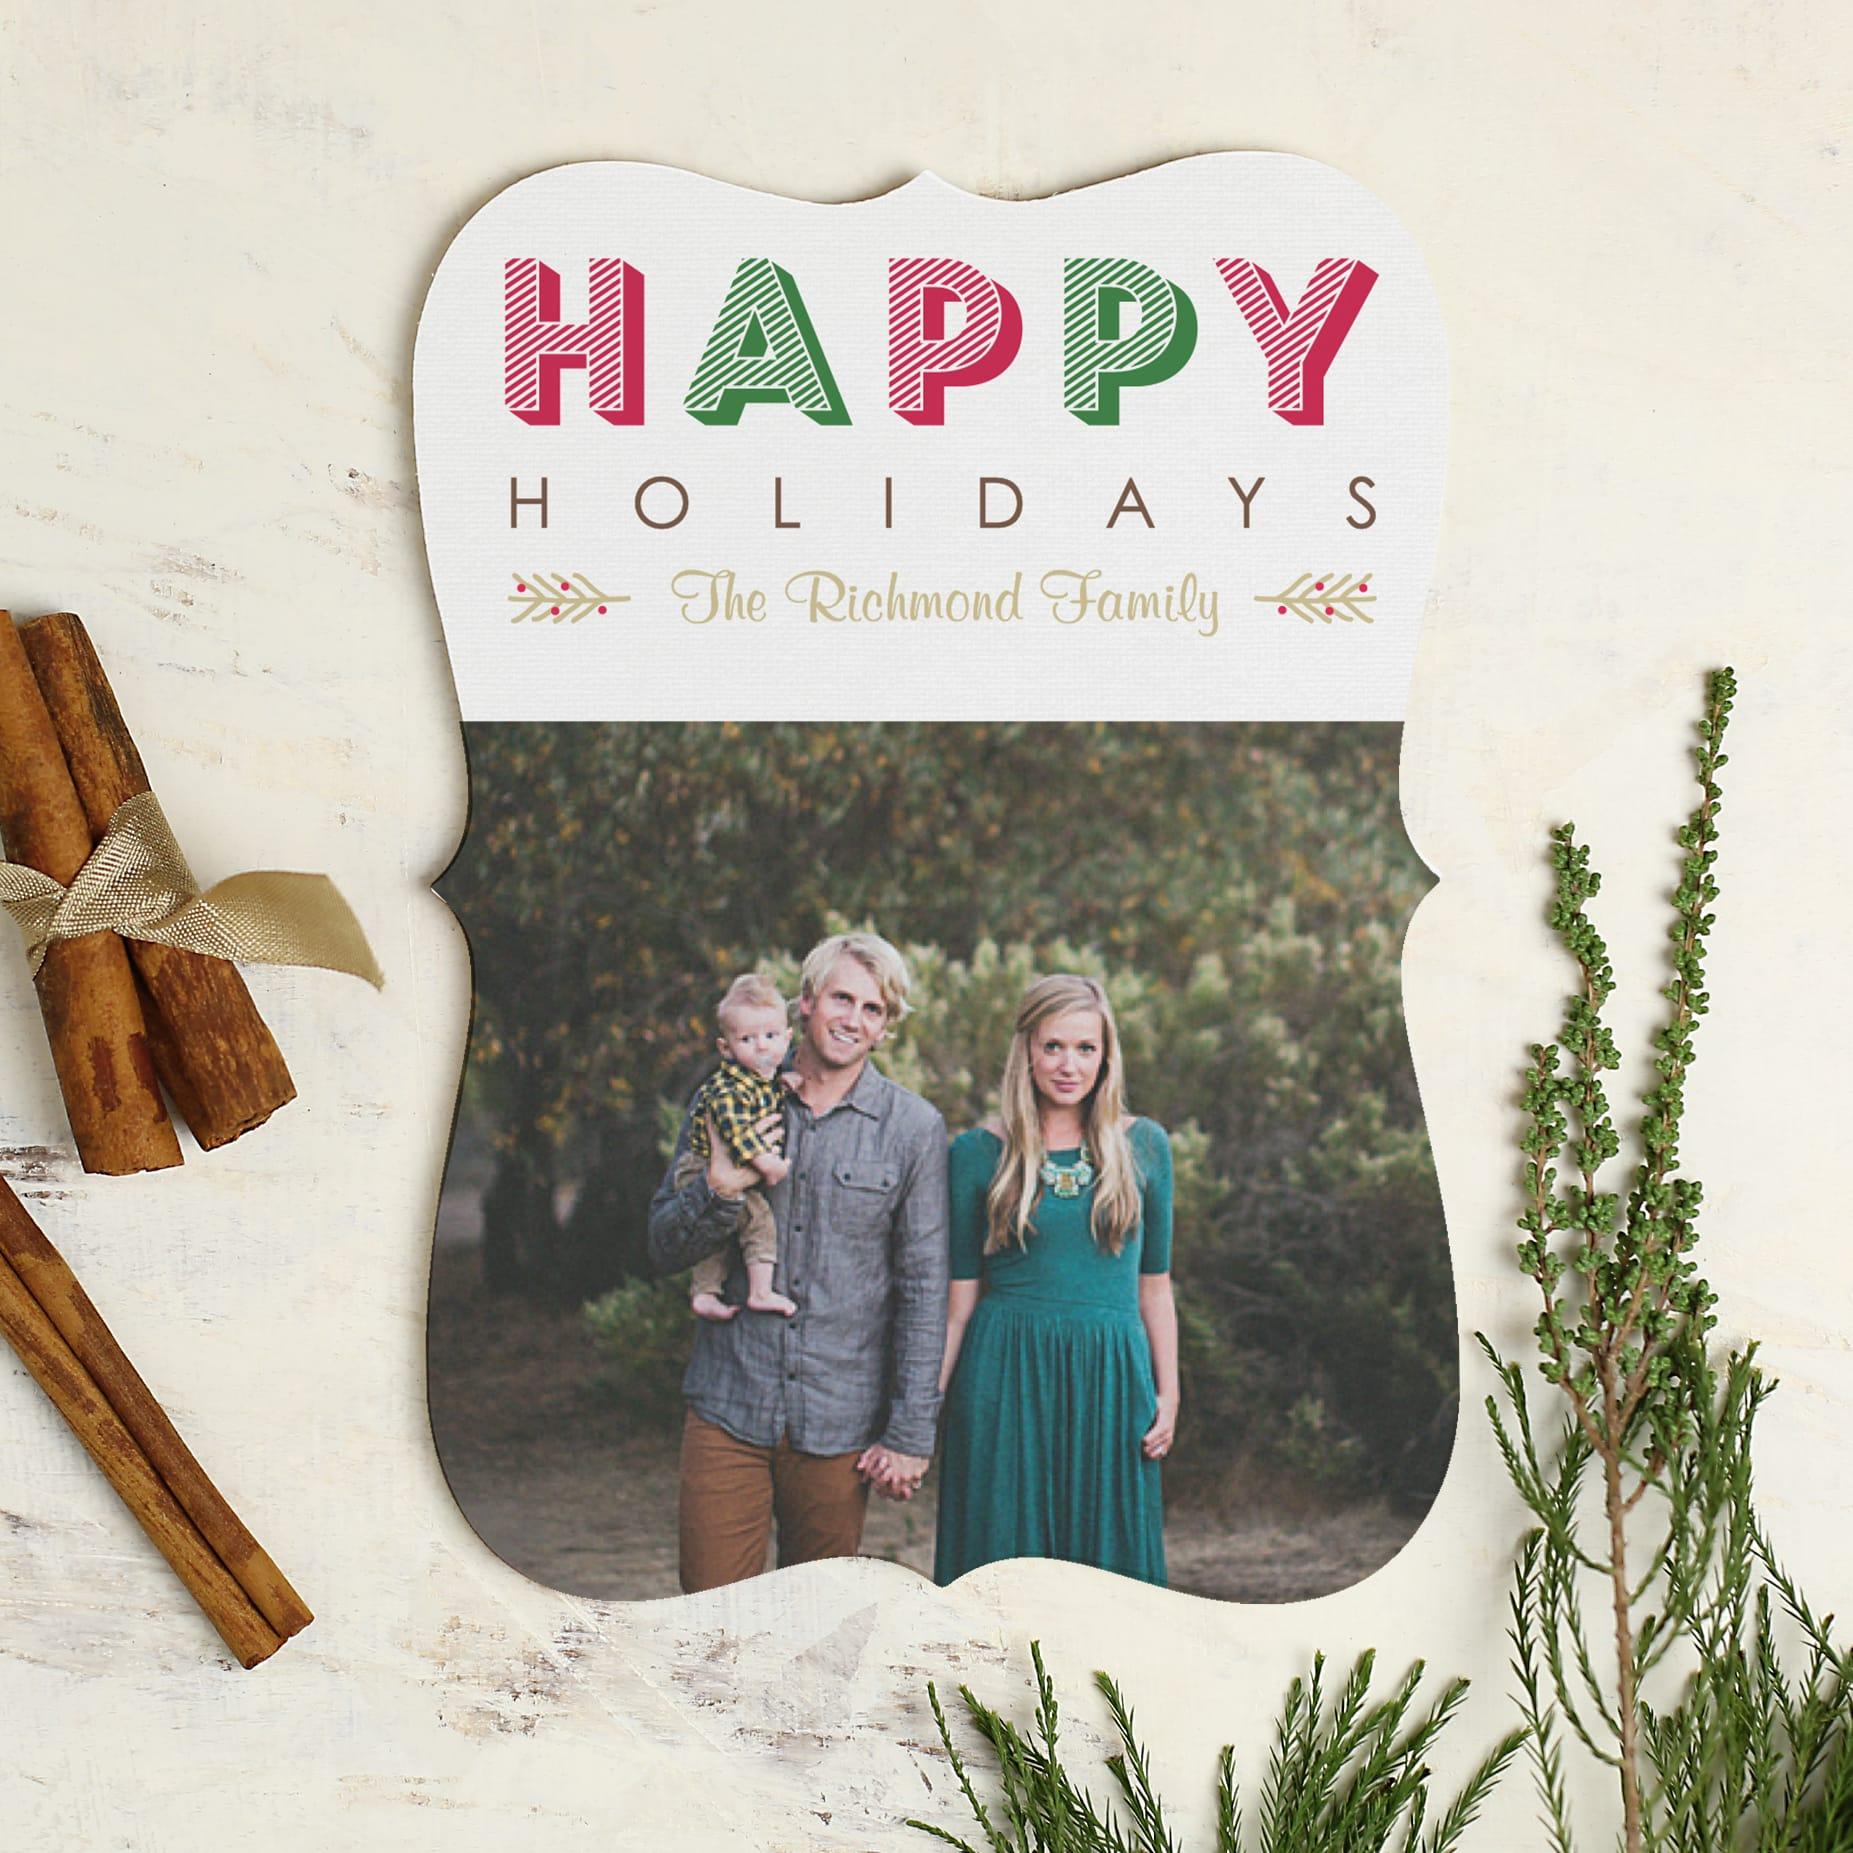 Basic_Invite_Holiday_Photo_Cards_7.jpg